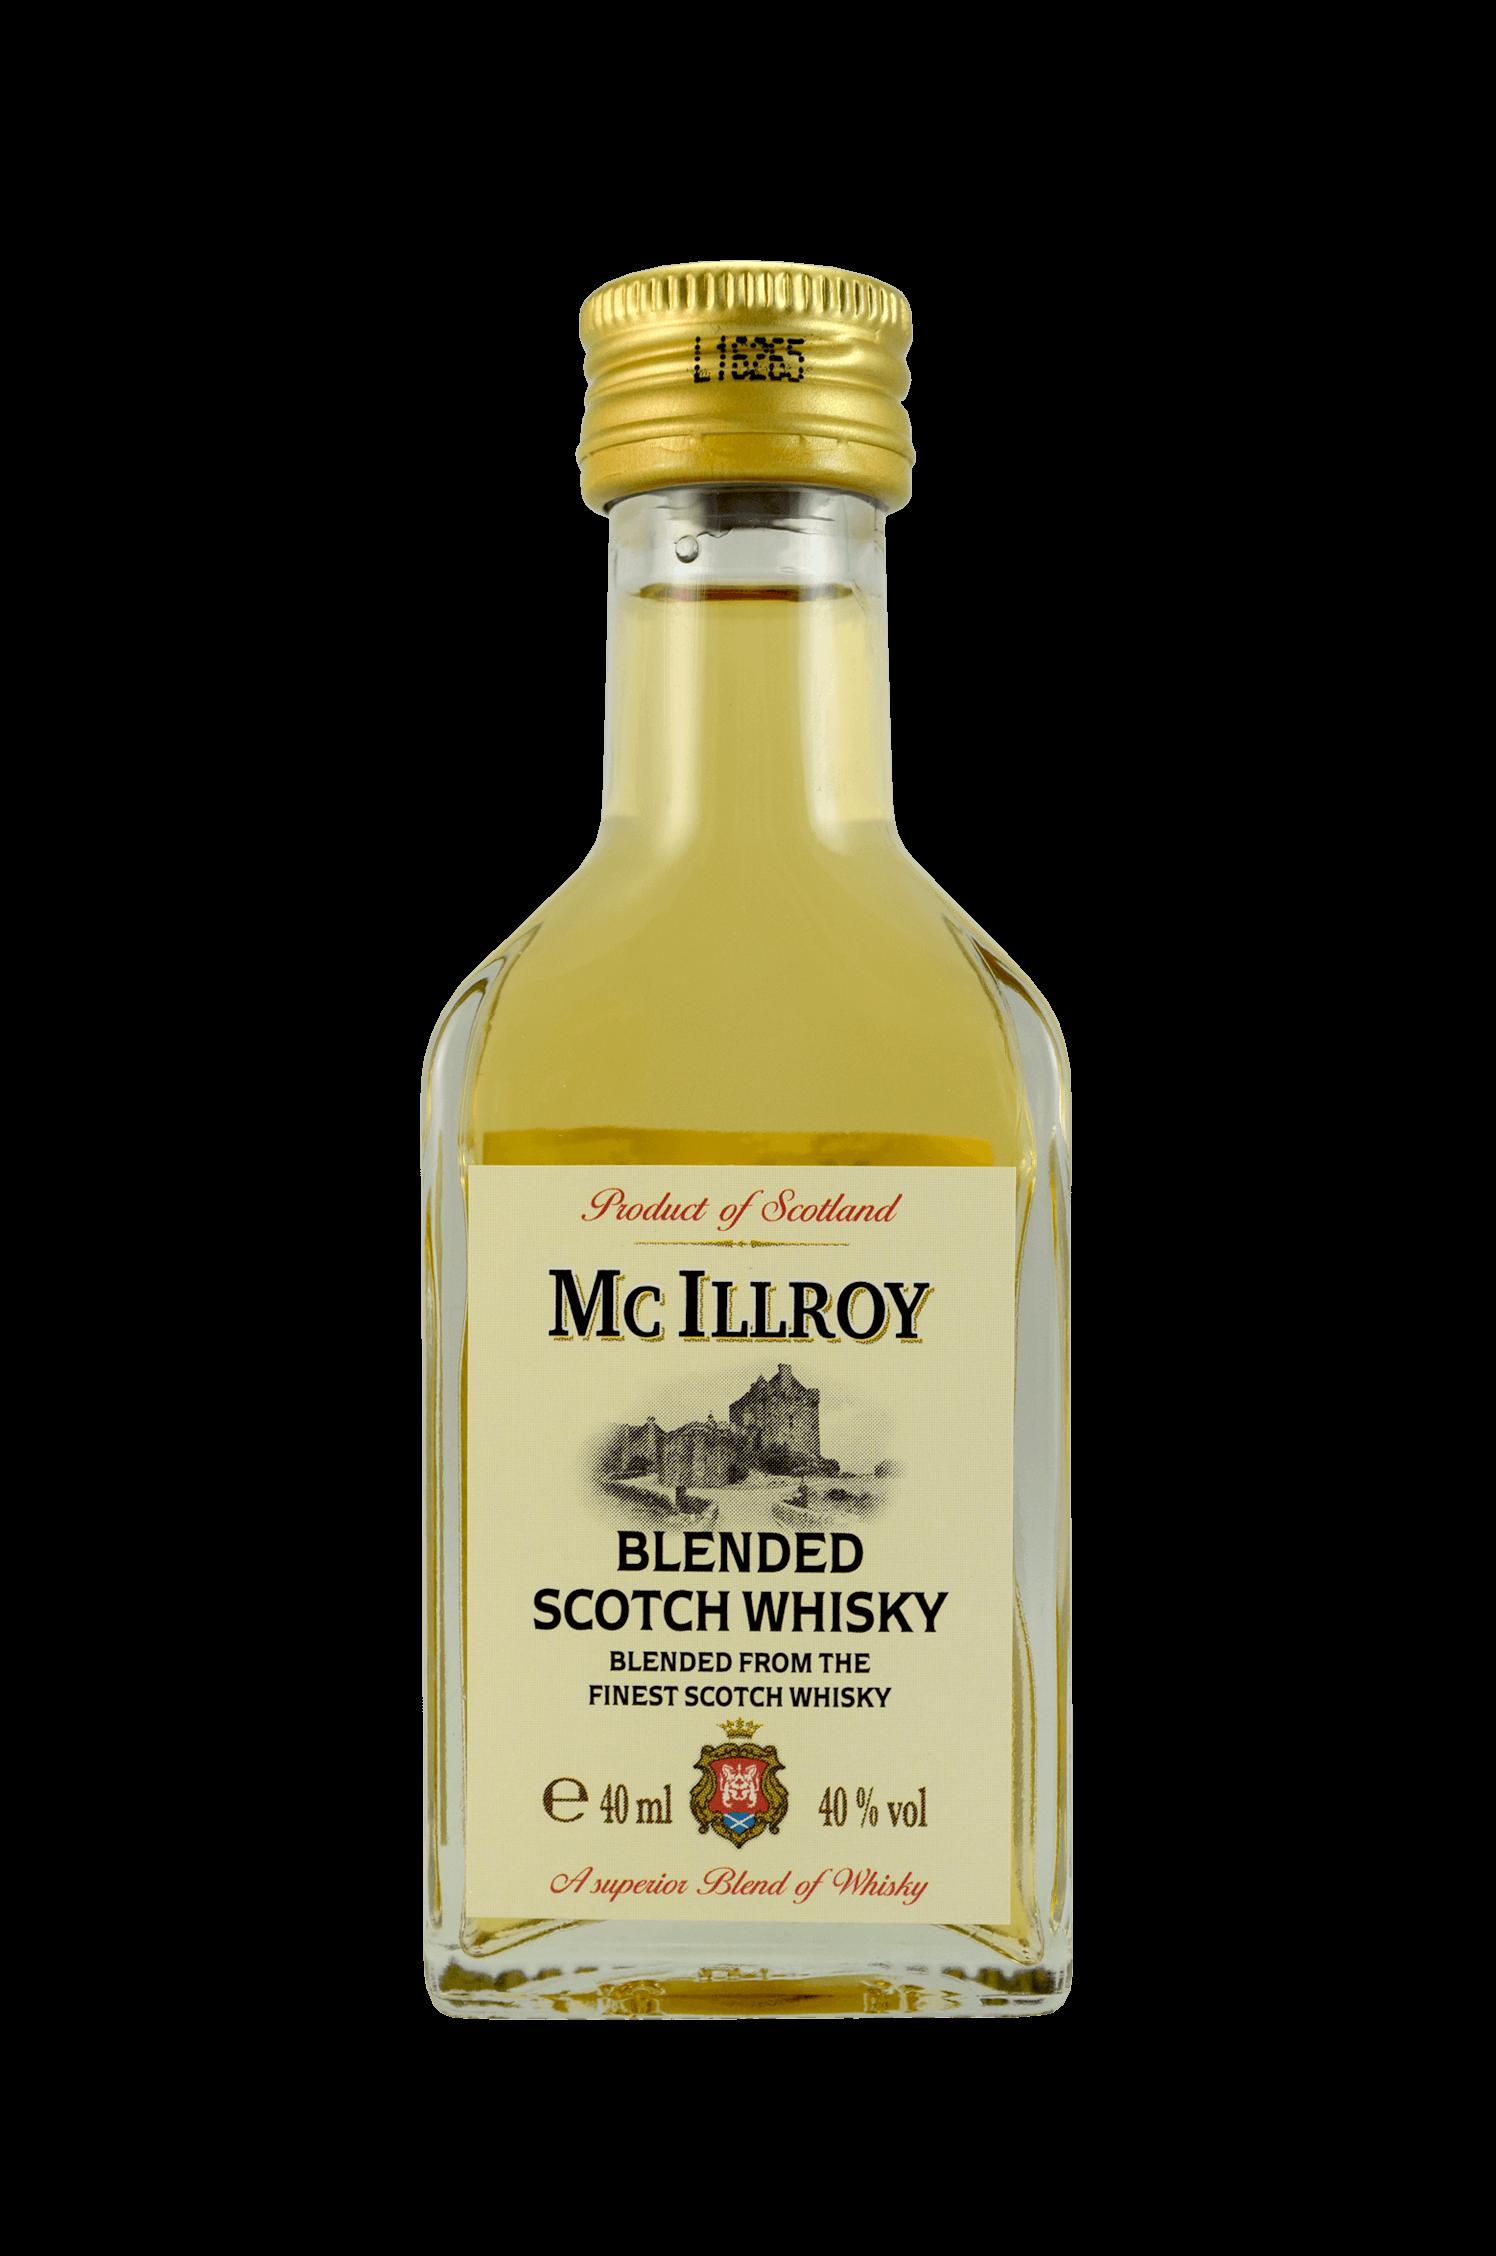 Mc Illroy Scotch Whisky